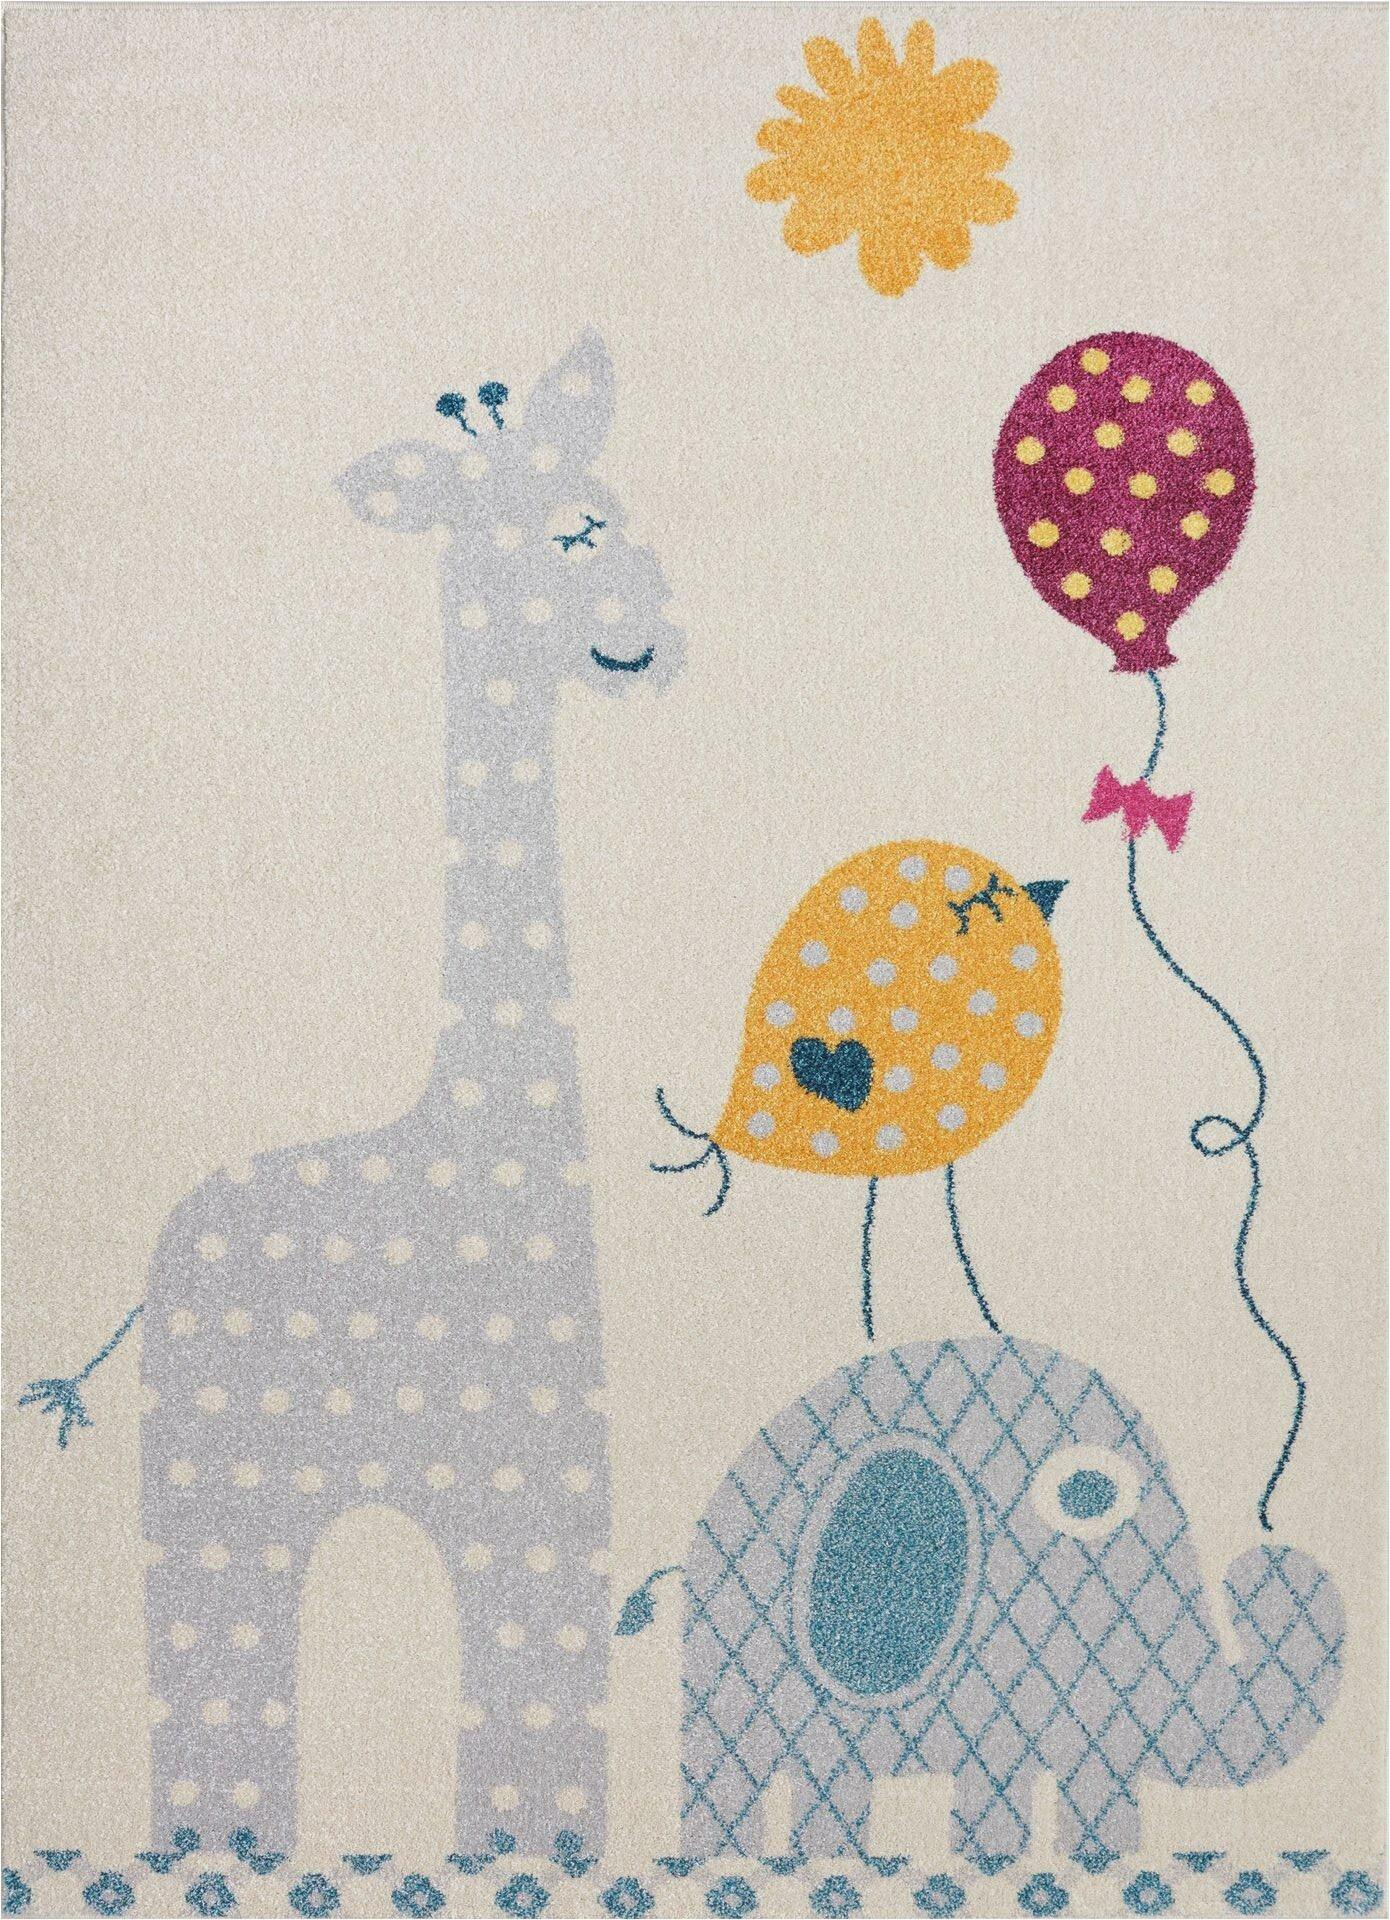 Area Rugs with Animals On them Holliman soft Cute with Baloons Sun Elephant Bird Giraffe Animals Dots Cartoon Gray Indoor Outdoor area Rug